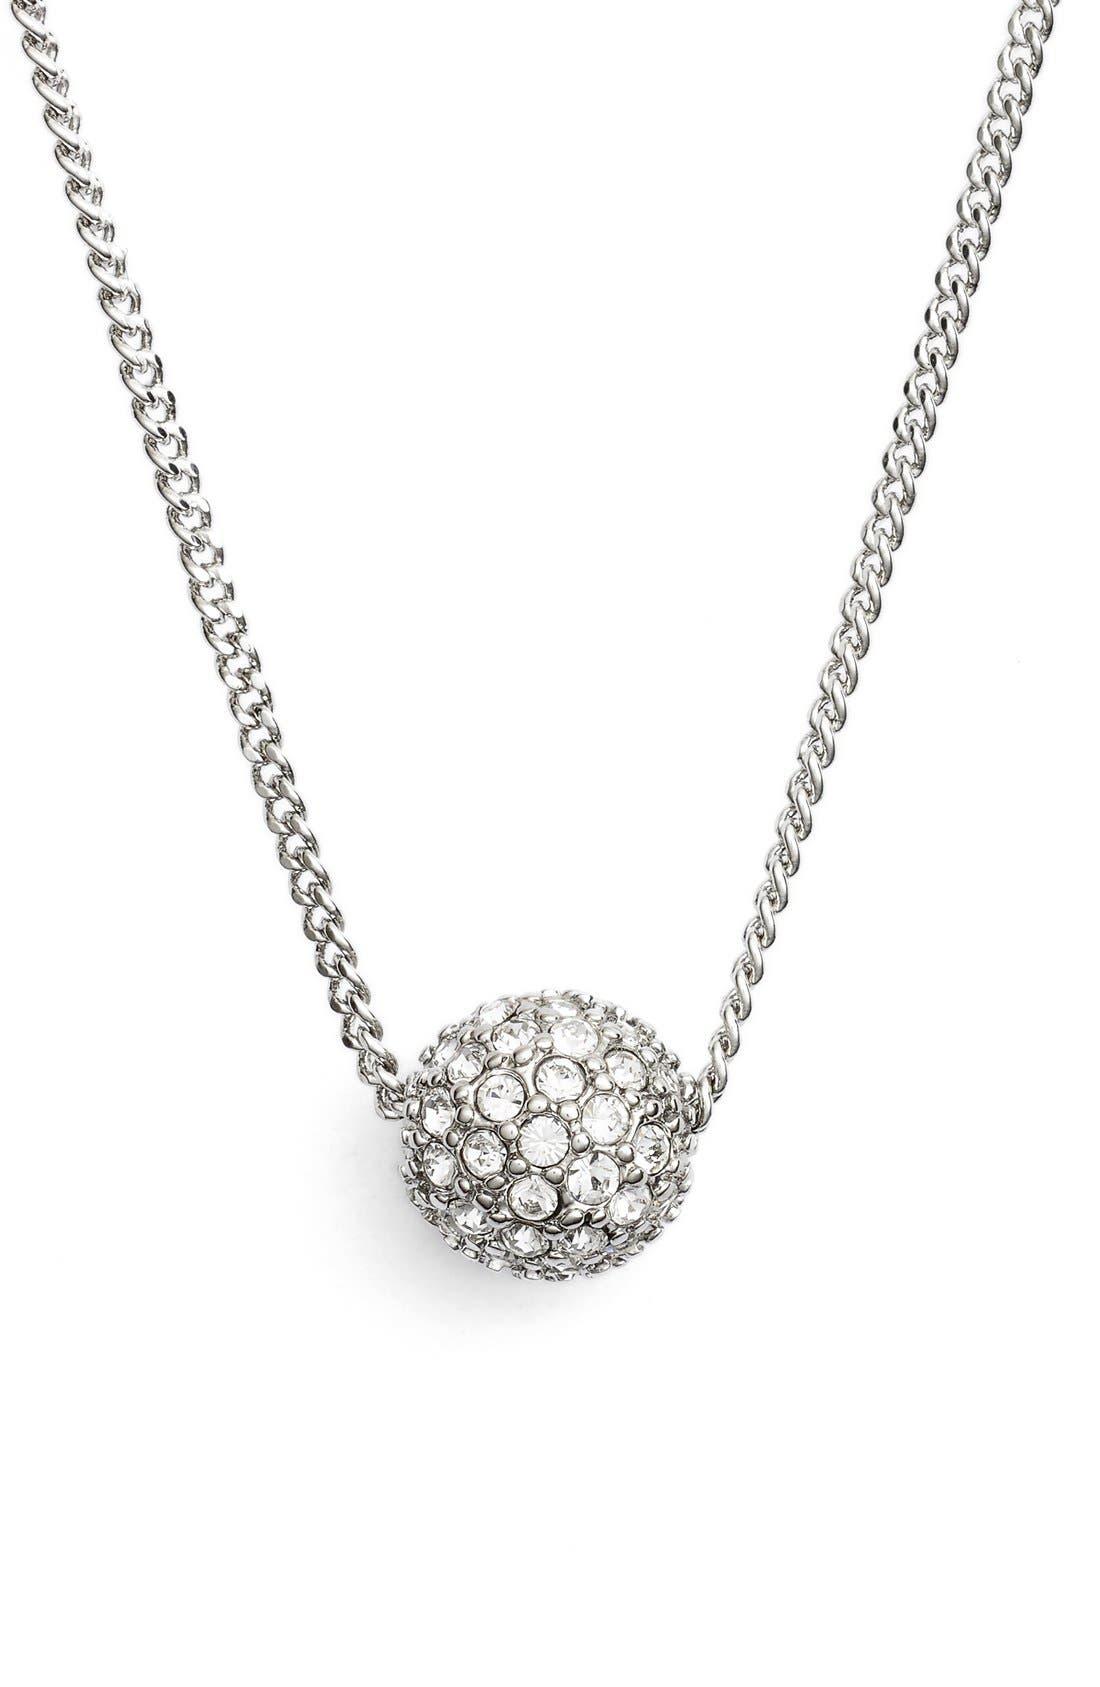 Givenchy 'Fireball' Pendant Necklace